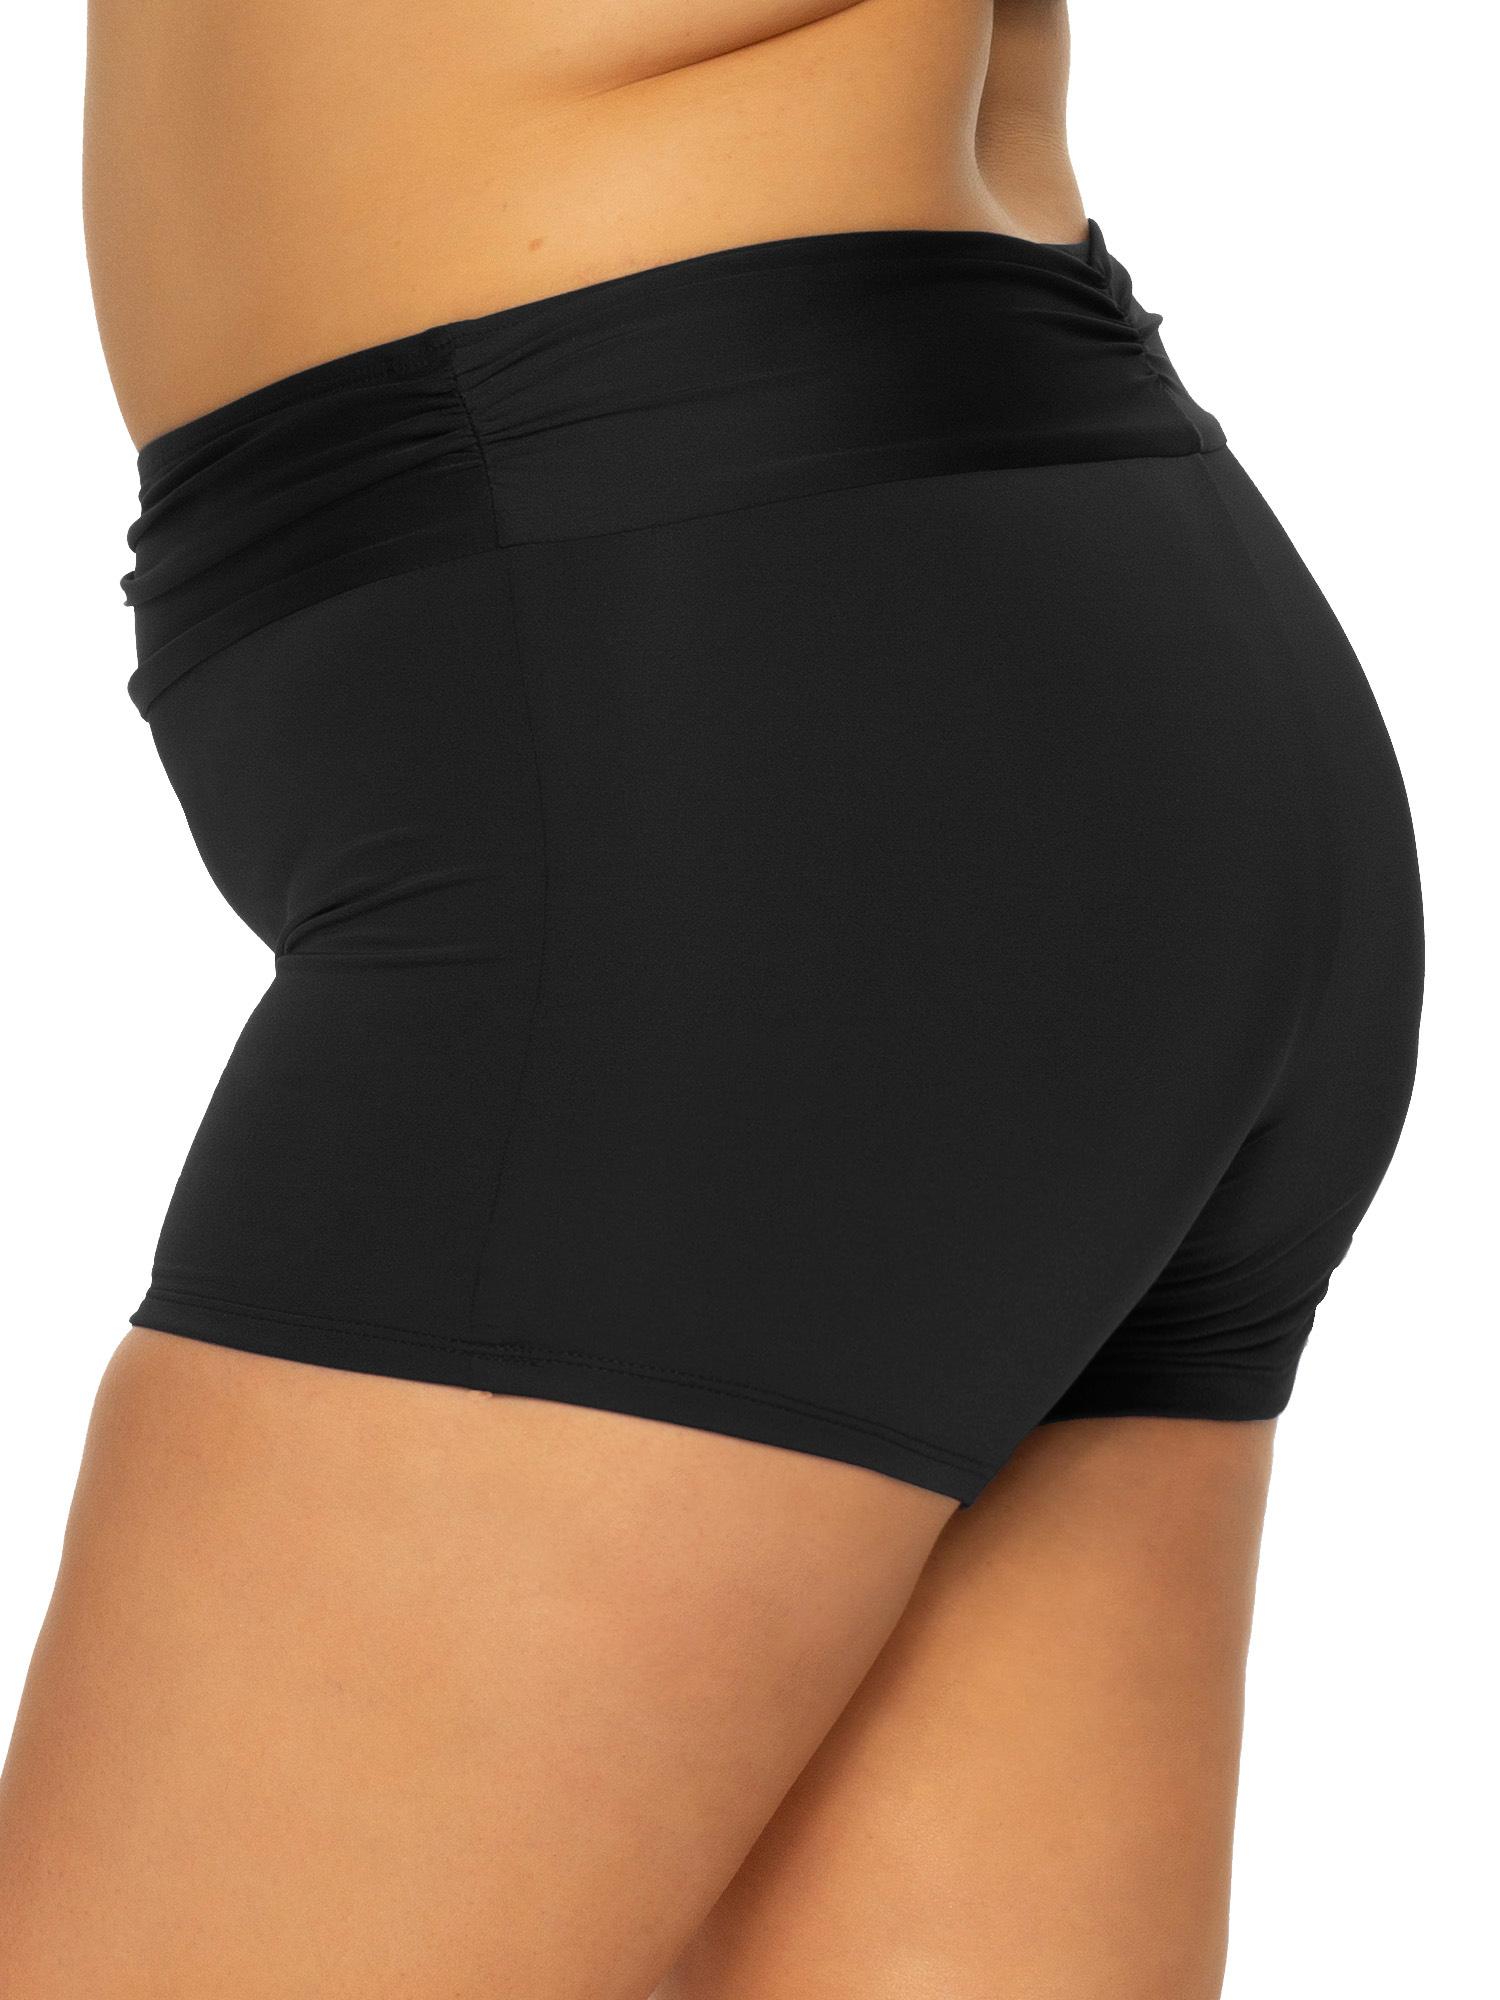 Men/'s Low Waist Swimwear Swimsuit Swimming Briefs Beach Shorts Plain Color C106